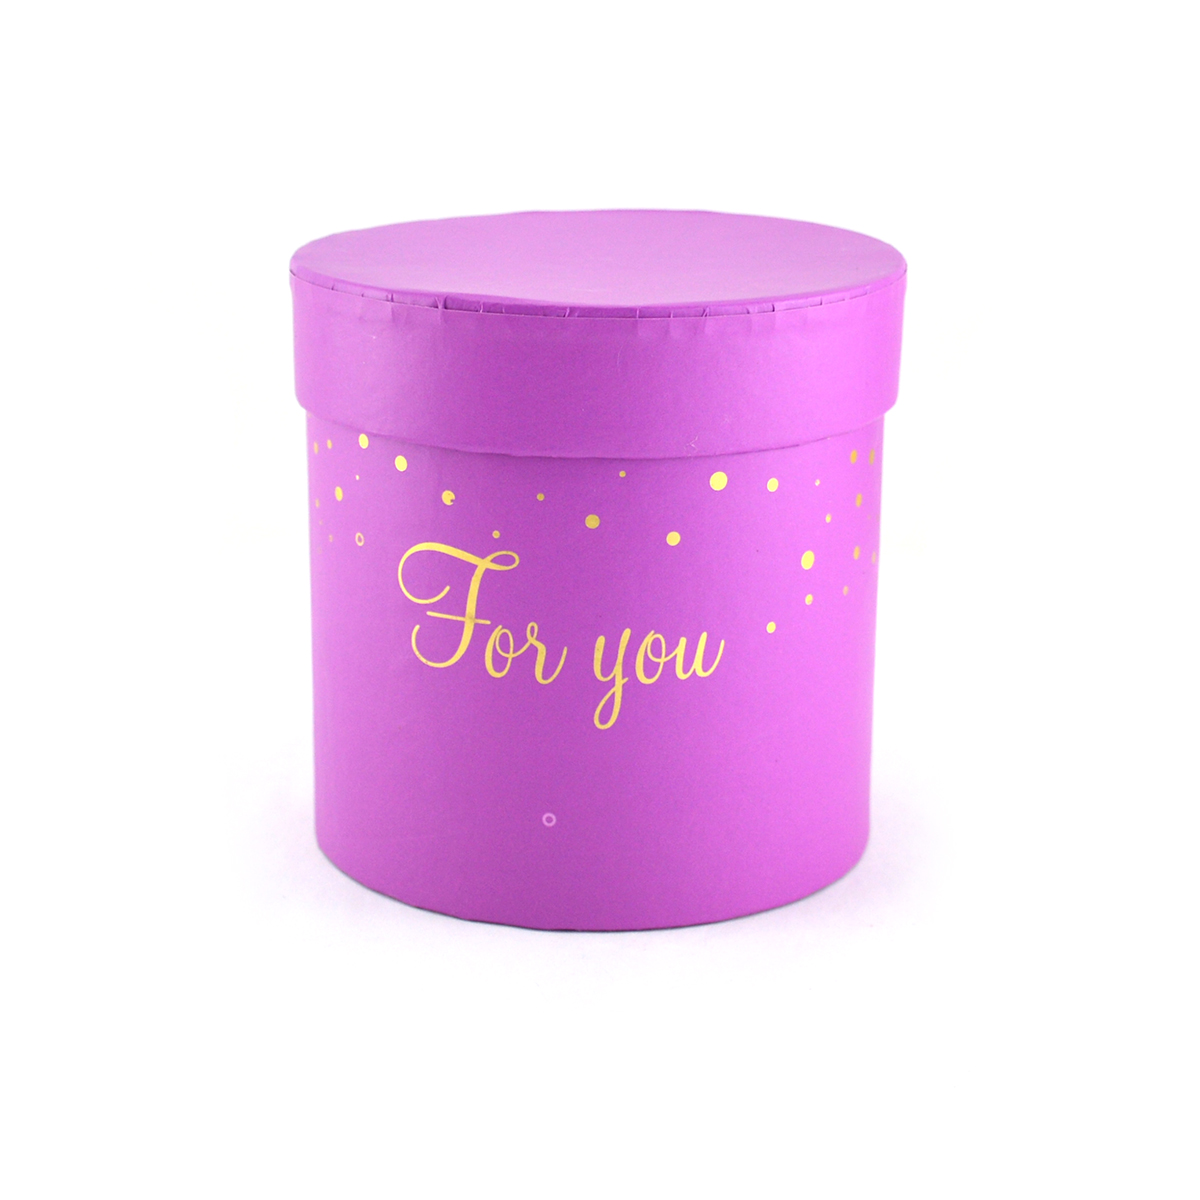 Cutie cilindrica fara manere for you siclam